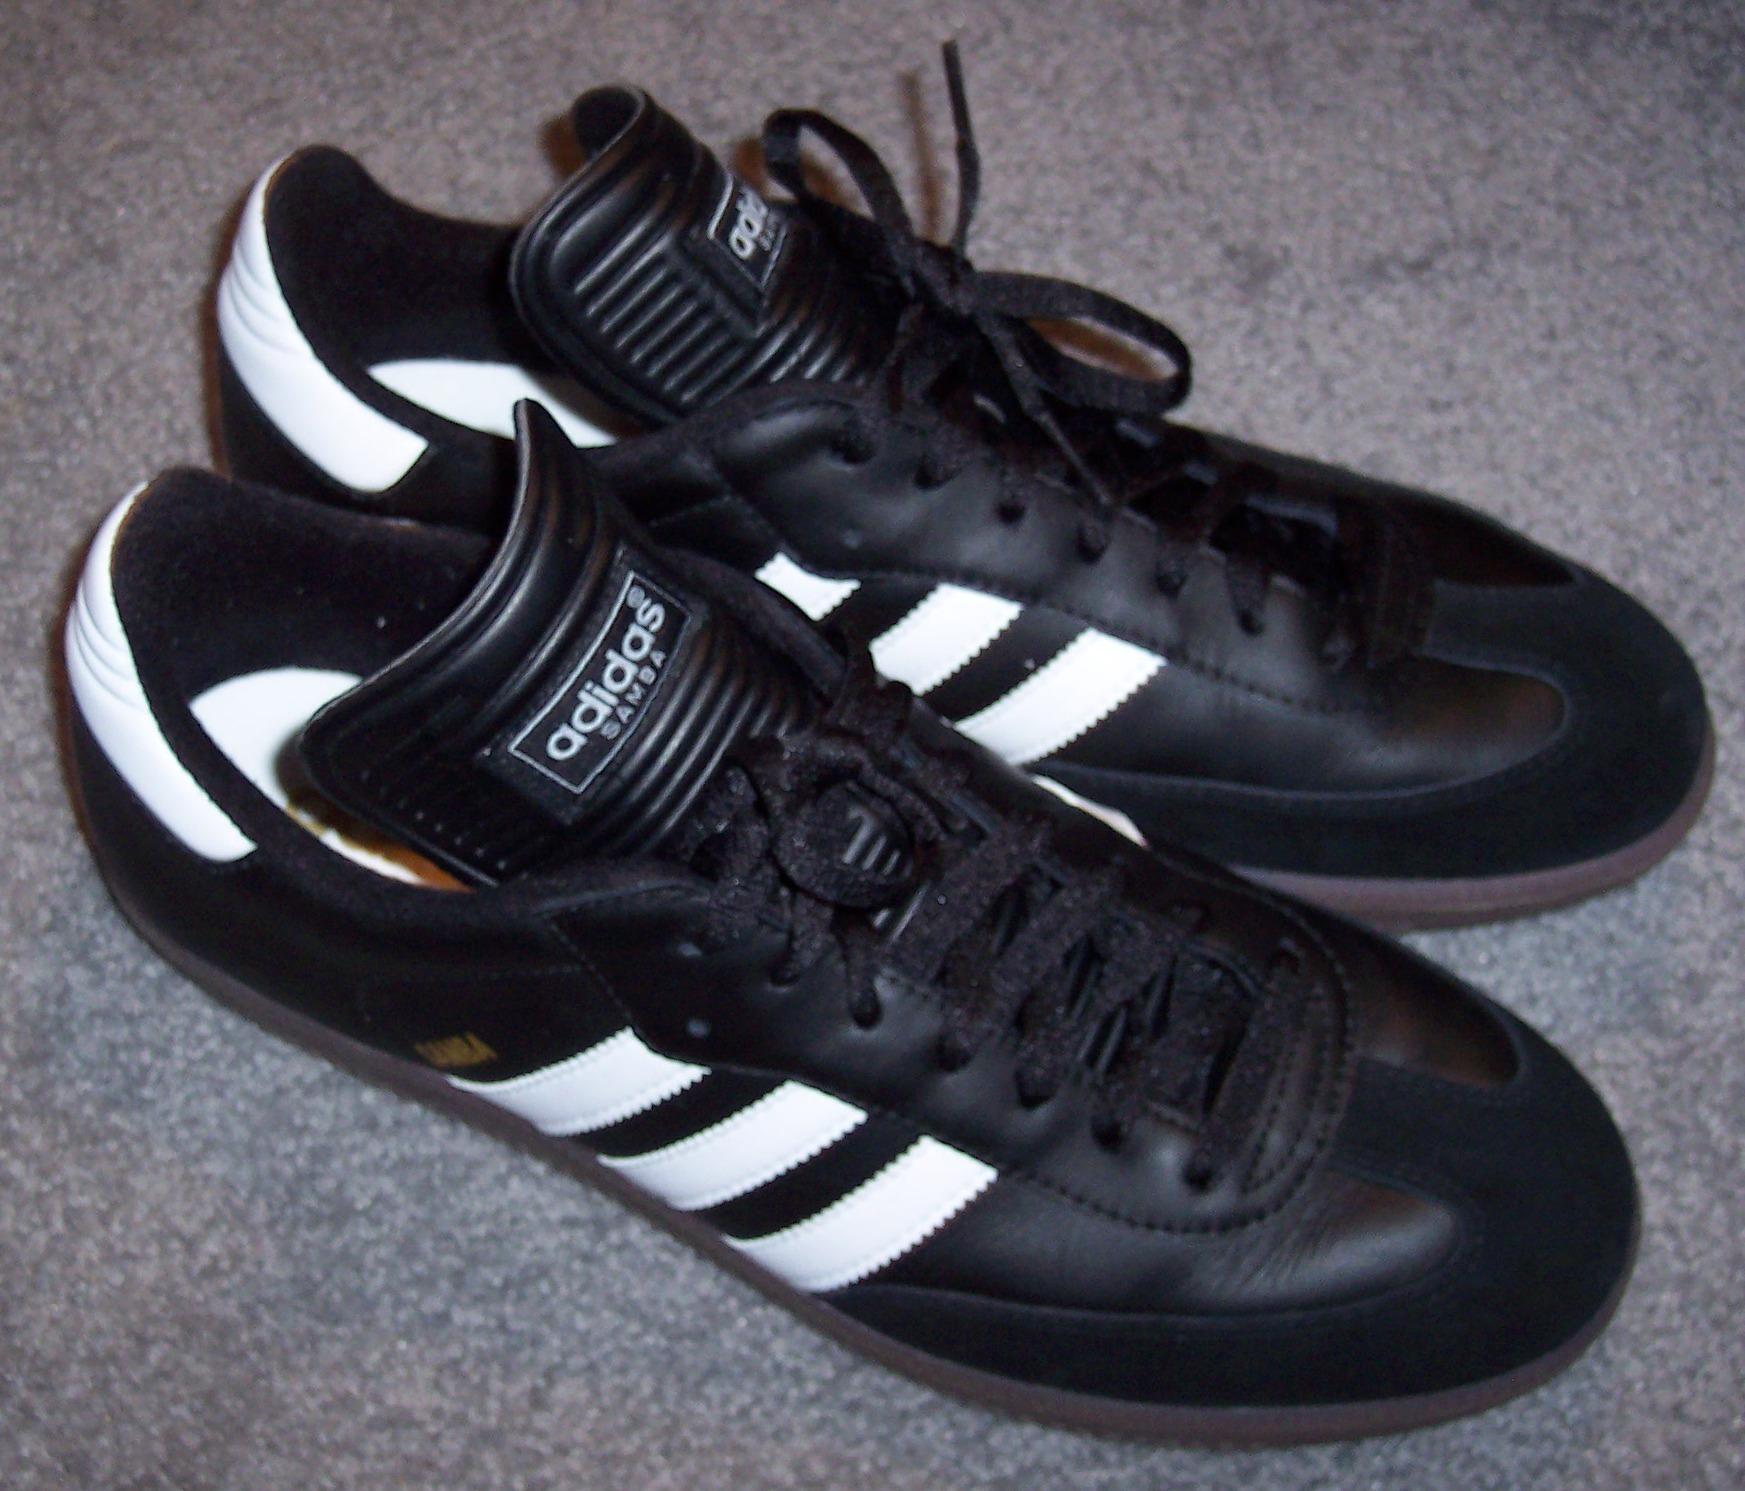 951c36af50d0 adidas shoes samba classic on sale   OFF68% Discounts